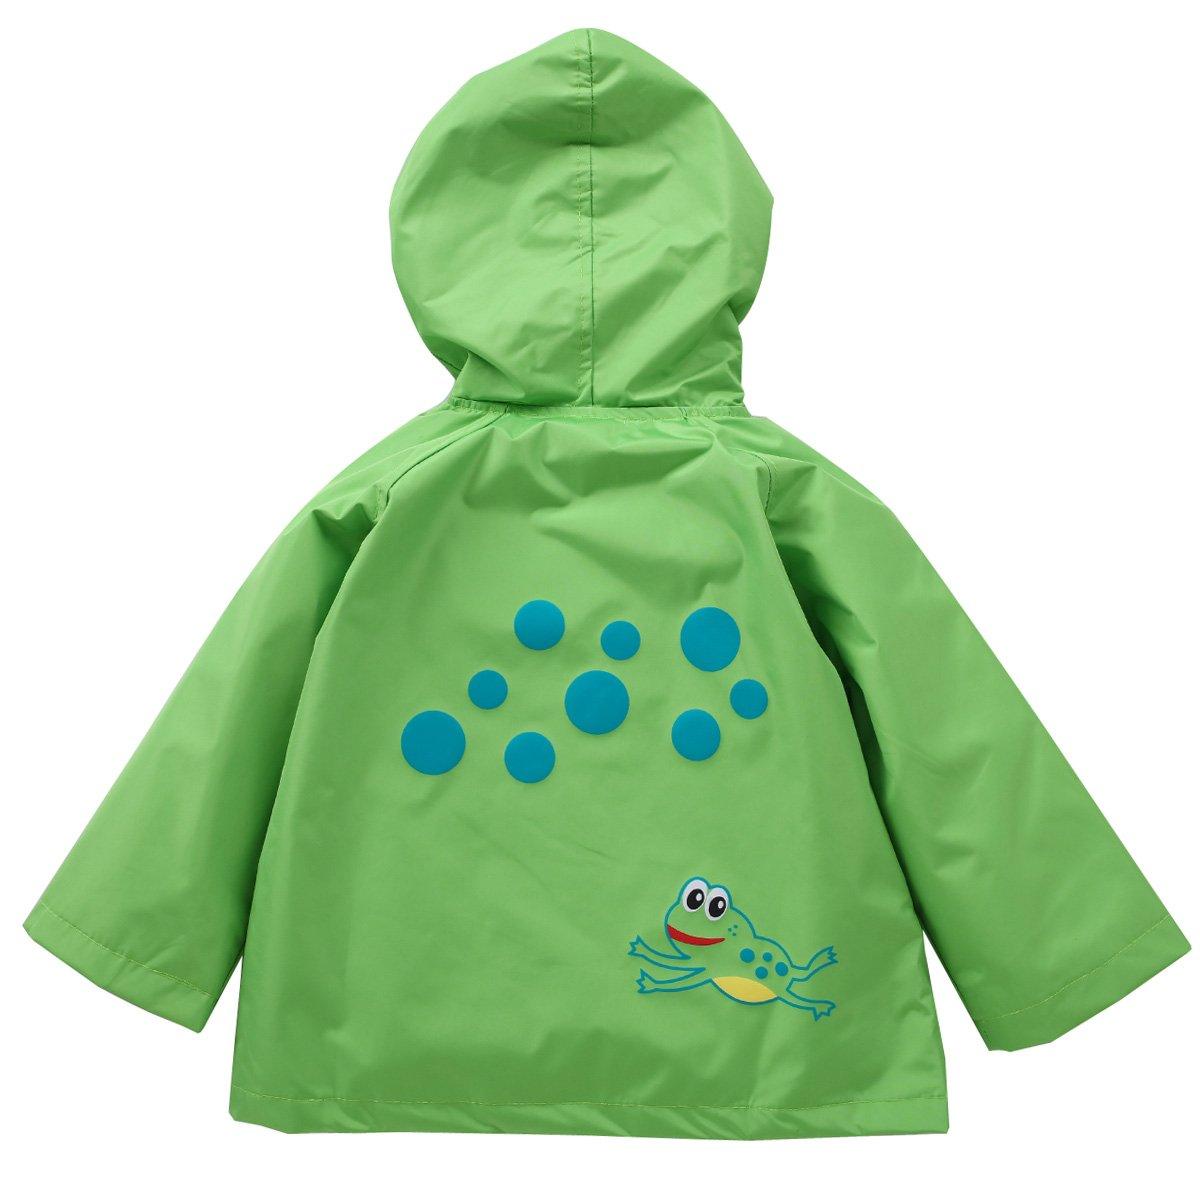 a780d74ceab2 Amazon.com  LZH Toddler Rain Jacket Girls Boys Raincoat Waterproof ...